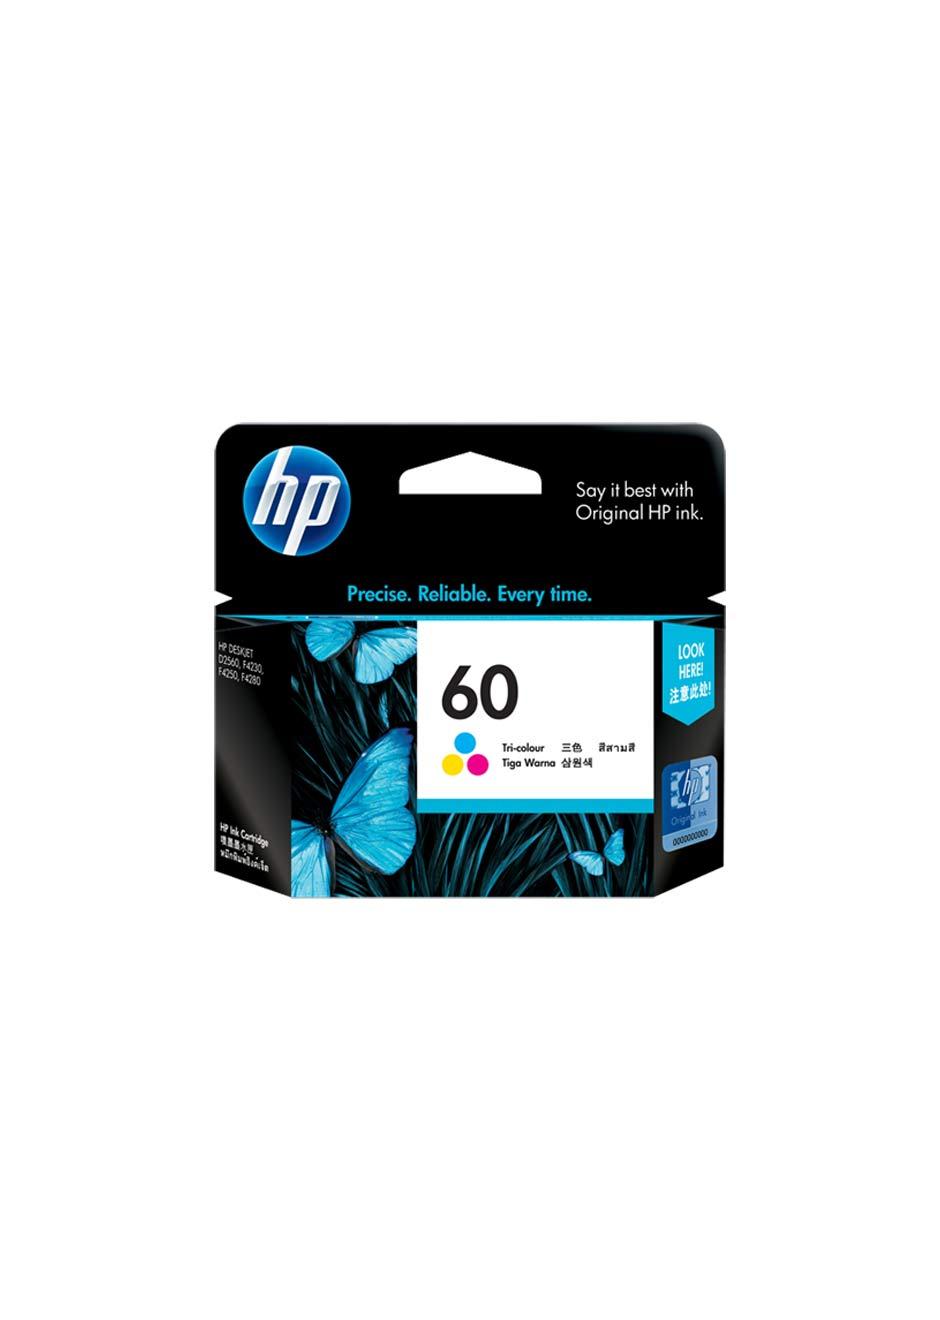 HP-60-color